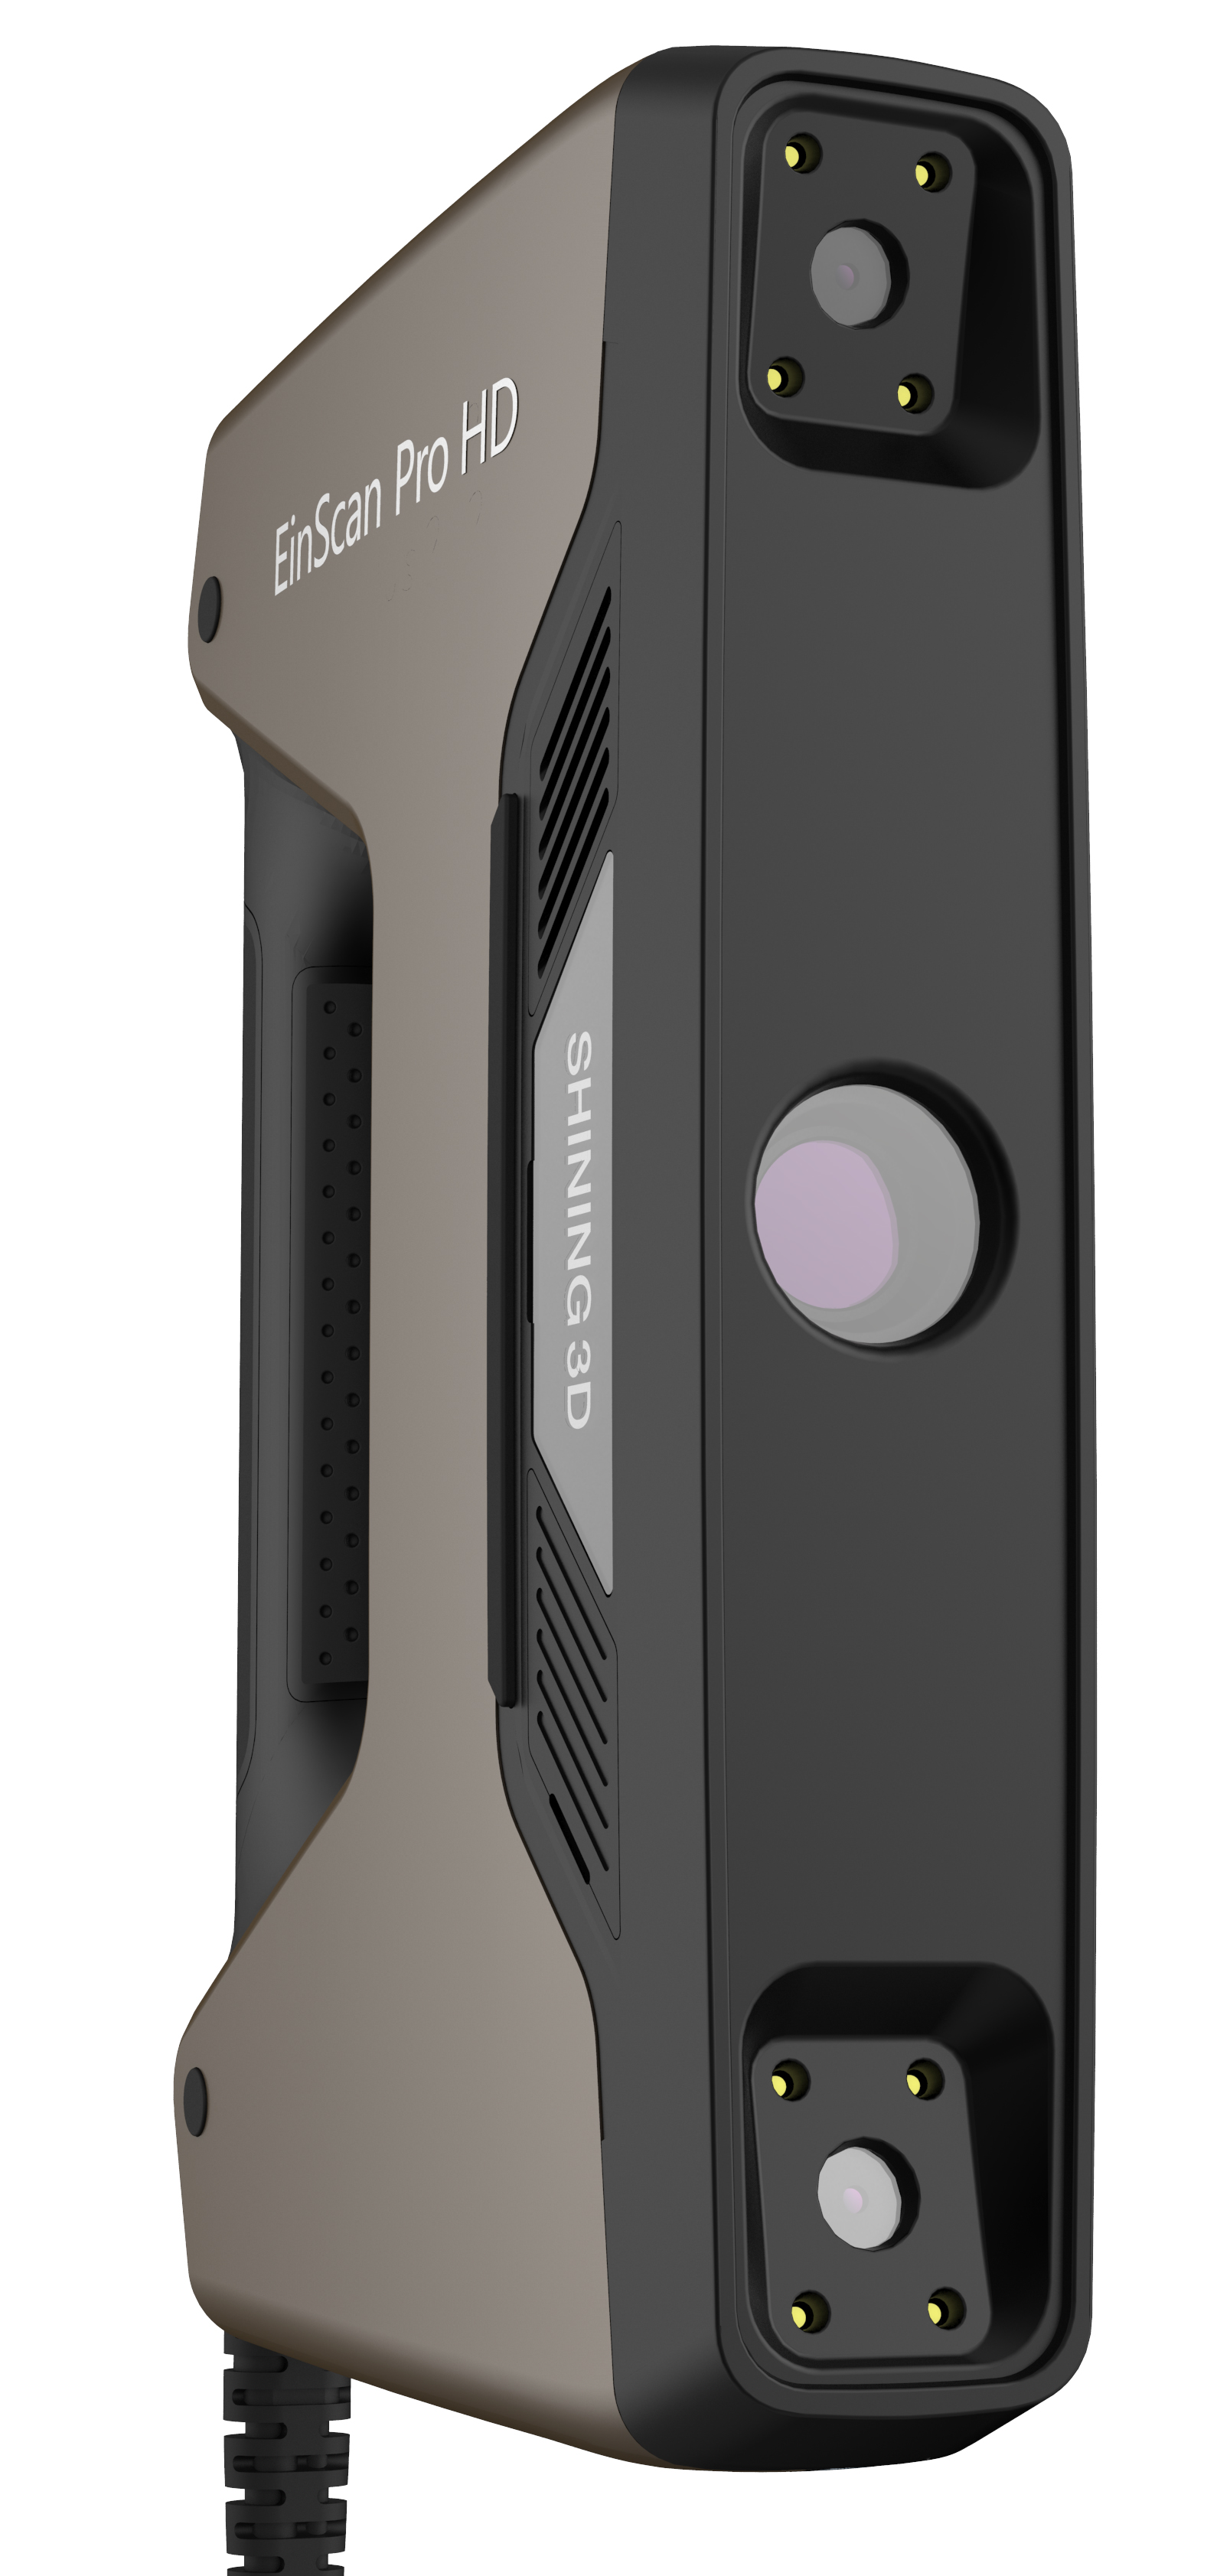 3D сканер Einscan Pro HD с Solid Edge